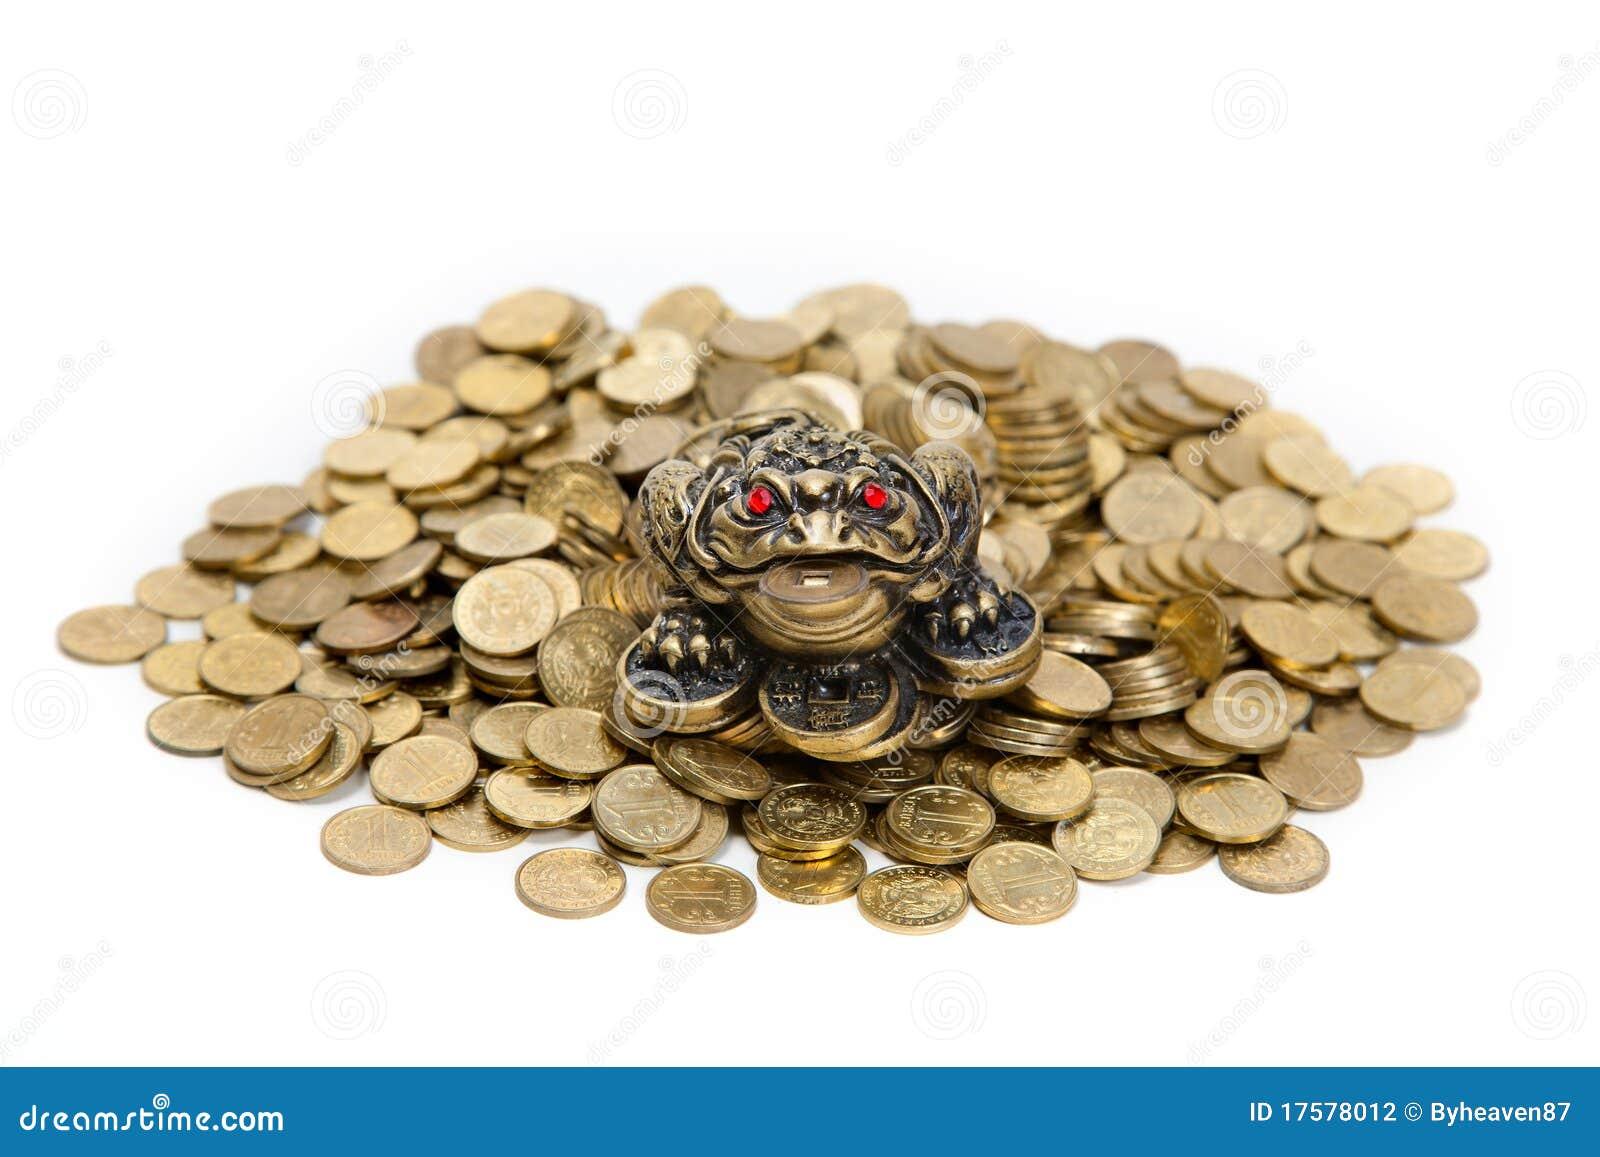 Rana de feng shui que se sienta en el mont n de monedas - Rana de tres patas feng shui ...